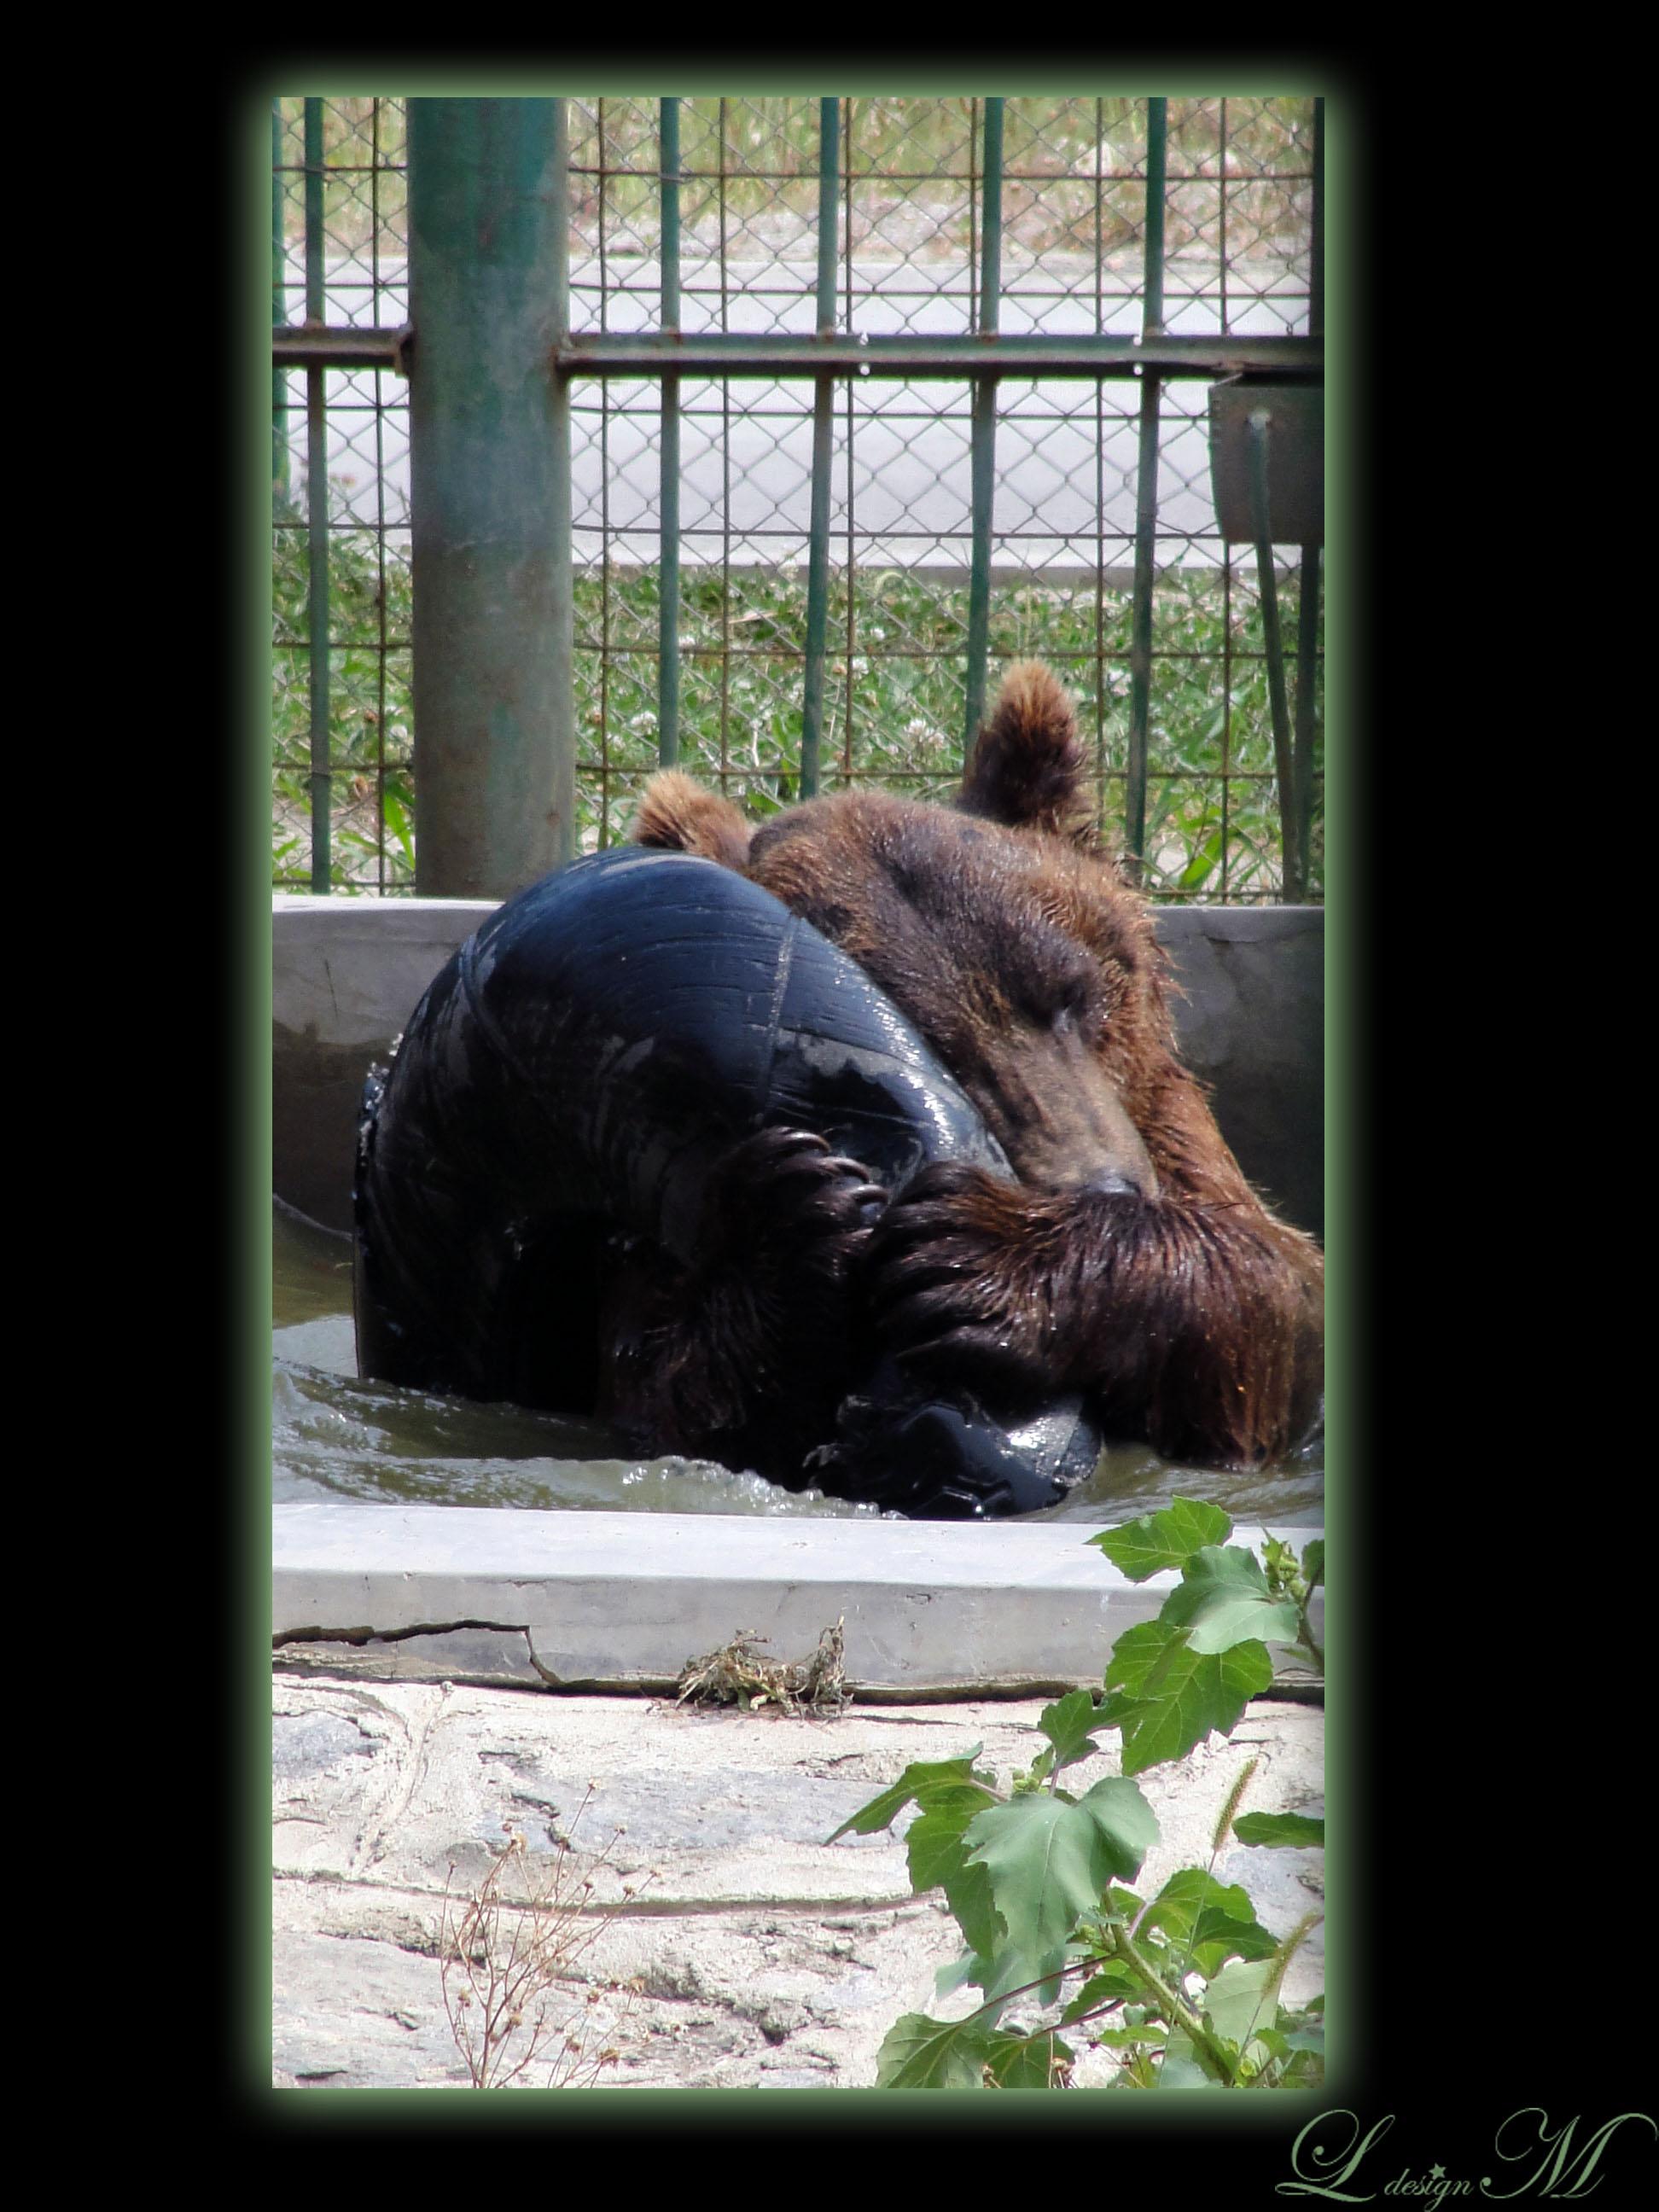 gradina-zoologica-zoo-Sibi-Romania-in-imagini-wild-animal-urs-jucaus-joaca-apa-baie-distractie